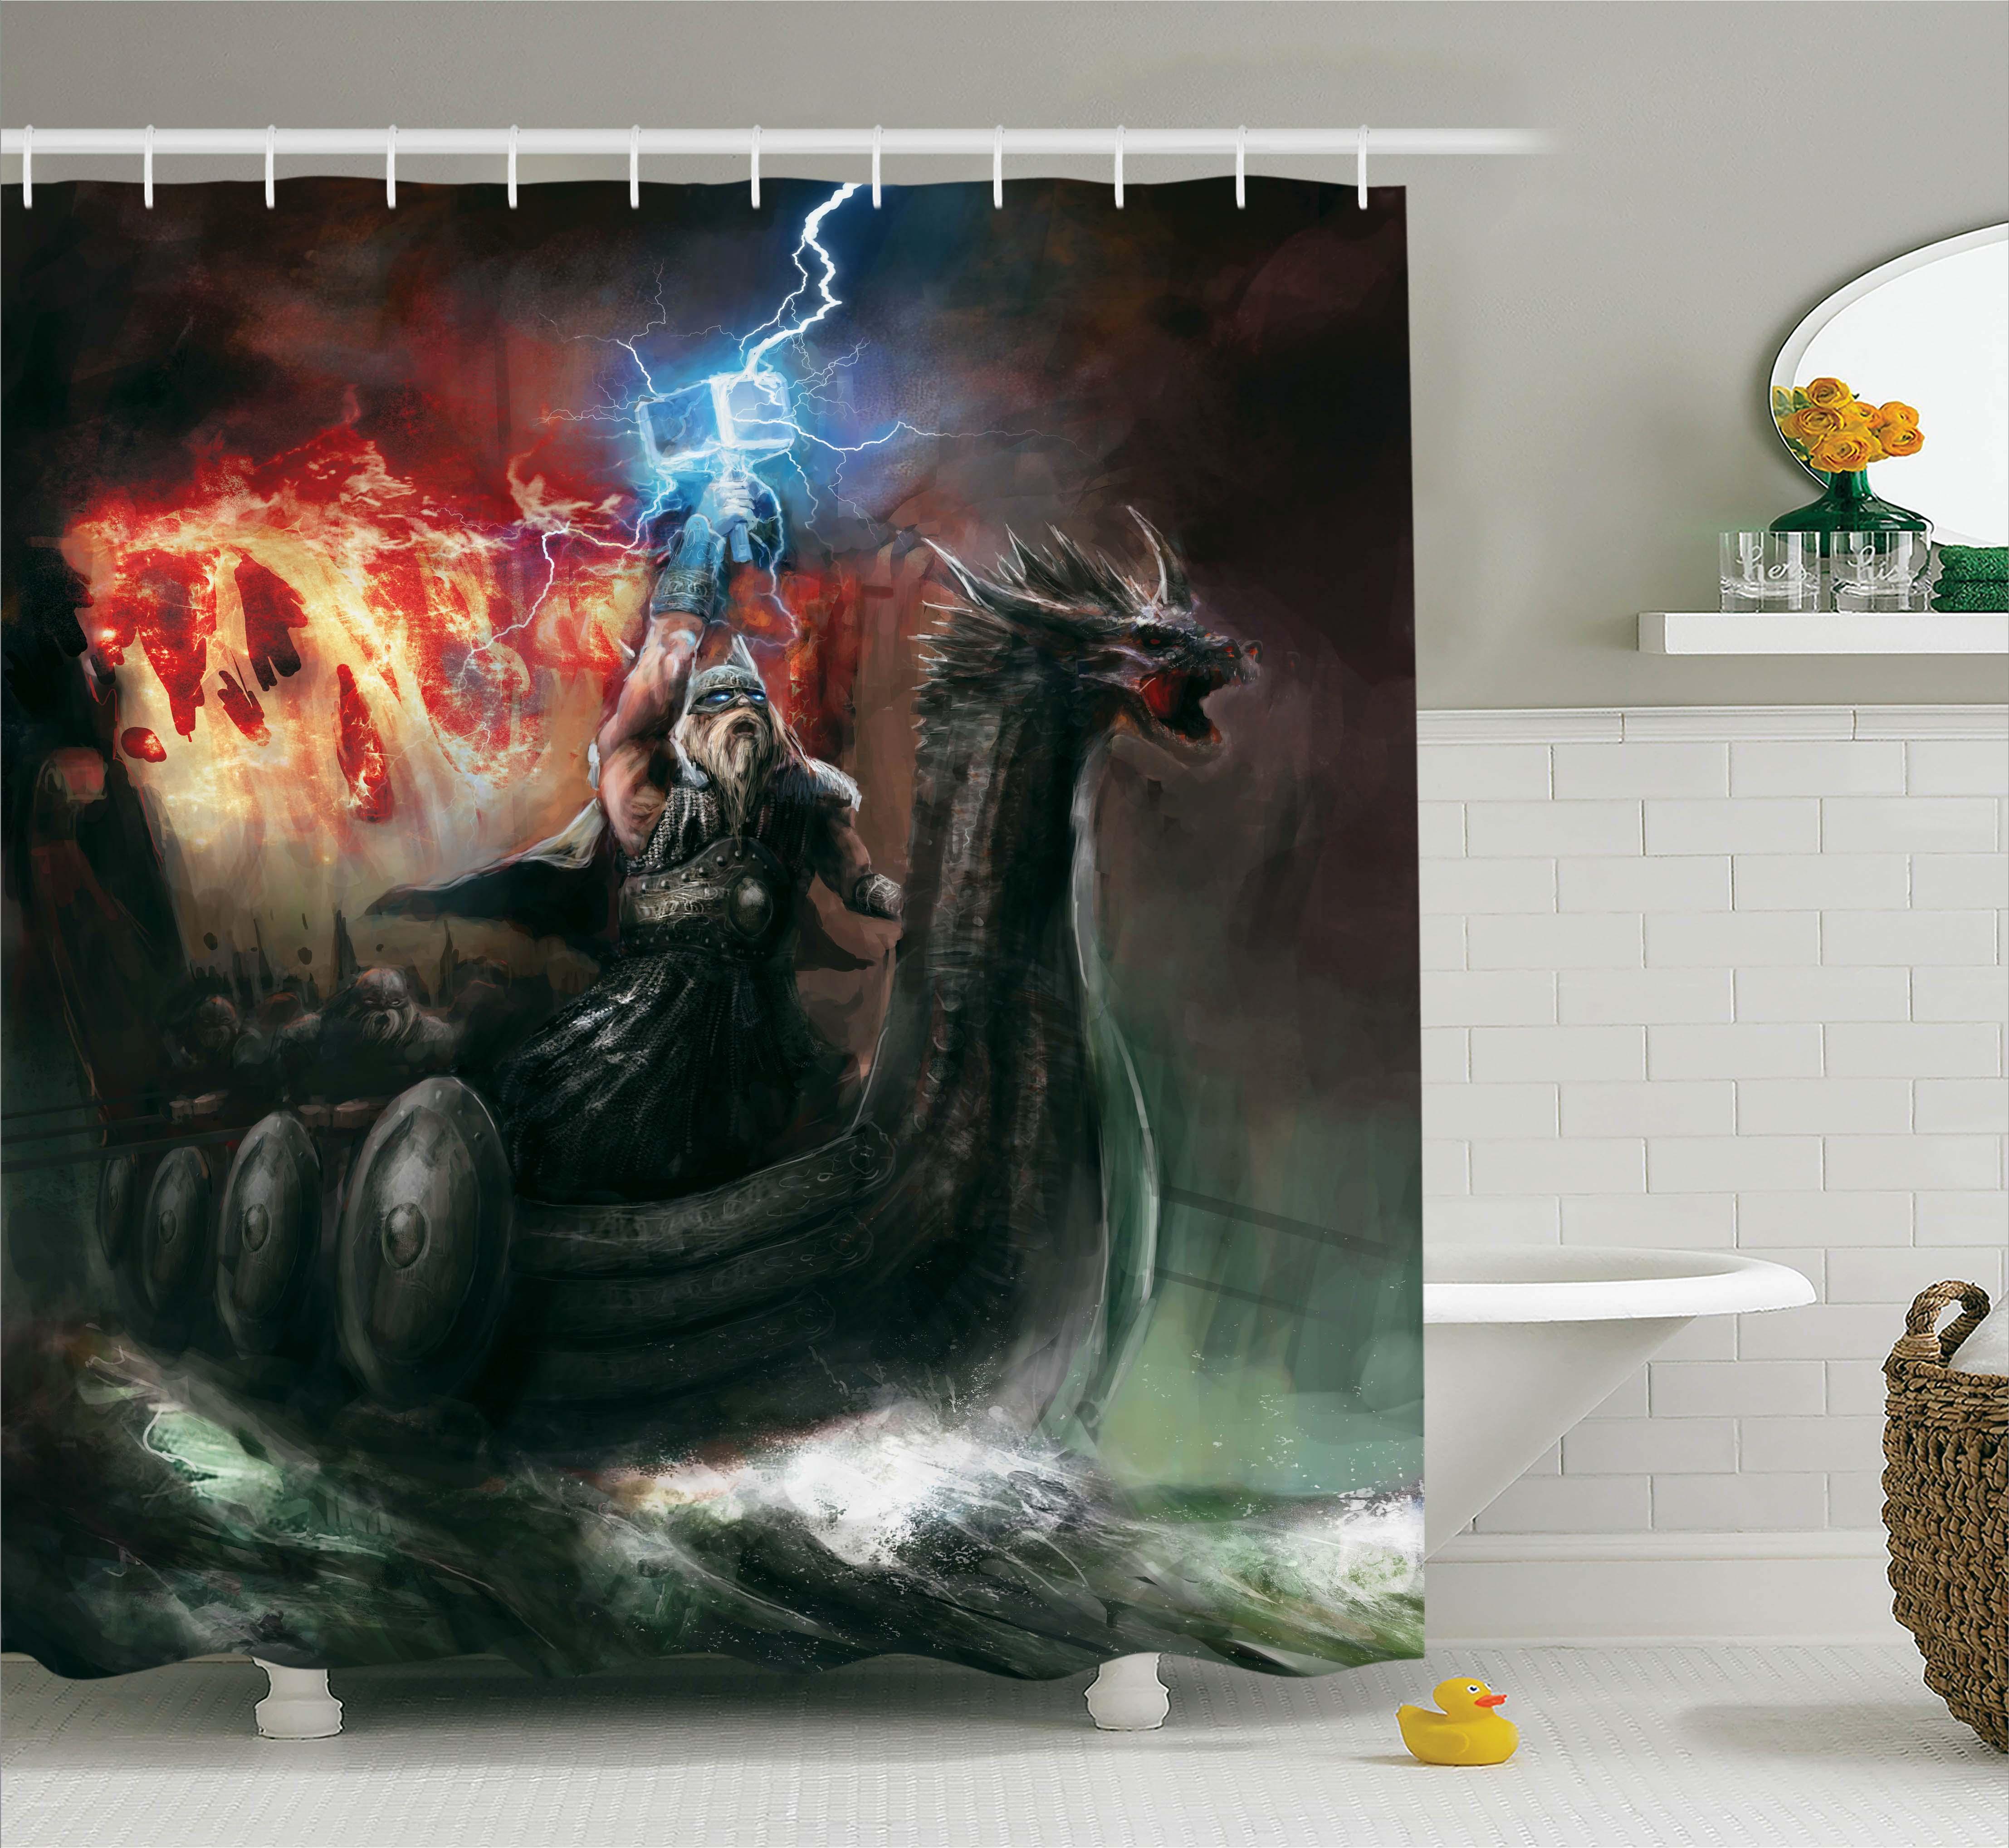 Lake House Decor  Imaginary Wrath Of The God Vikings Roya...